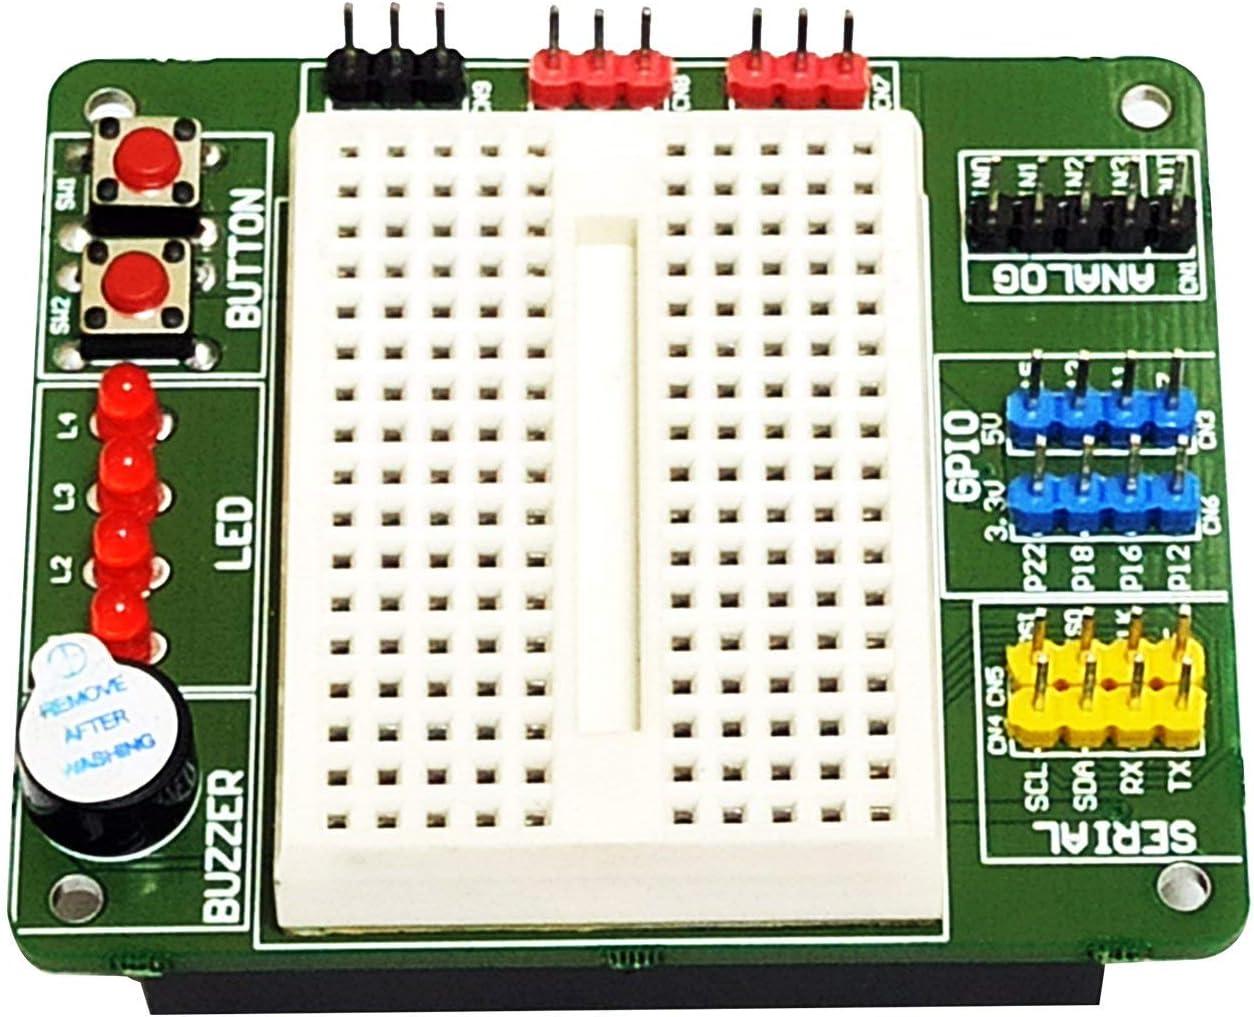 sb components BreadPi Multipurpose HAT for Raspberry Pi 4 3 Zero and Zero W 3B+ Raspberry Pi Expansion Board Designed for Digital and Analog I//O Manufacturer 2